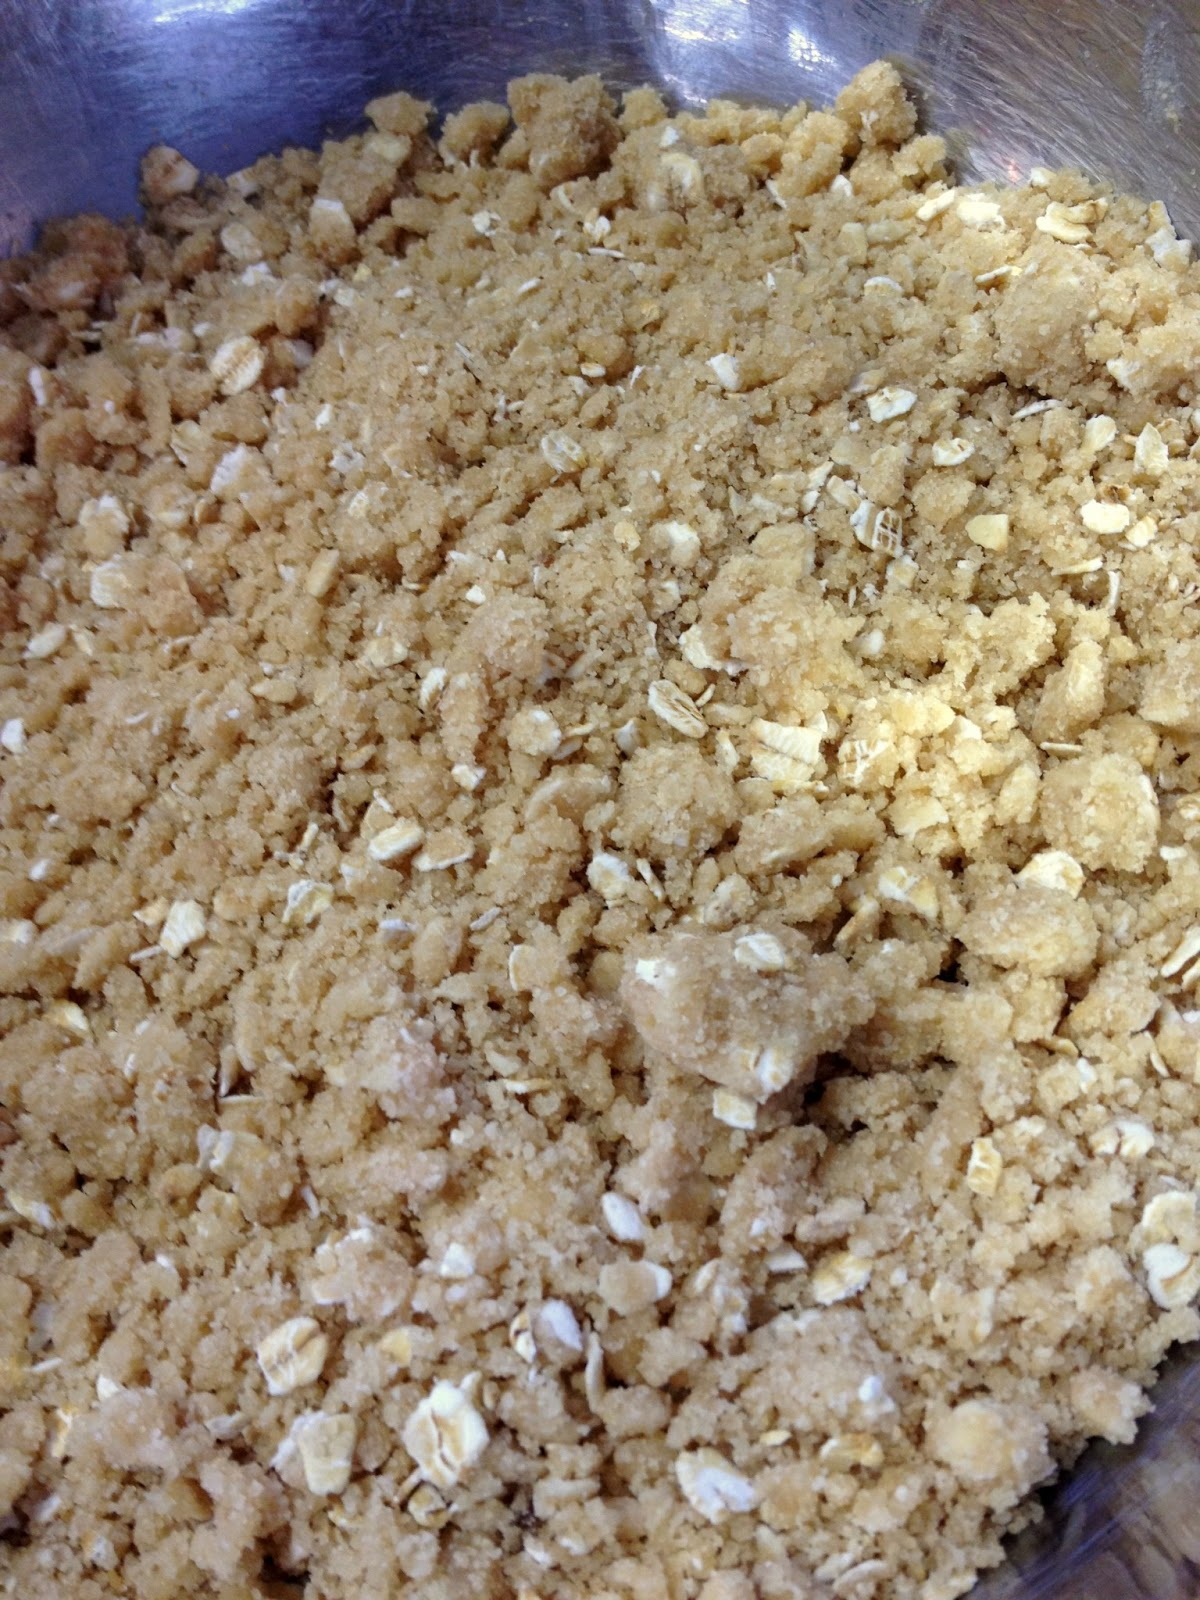 Kitchenjoy Caramel Apple Cheesecake Bars Baking With